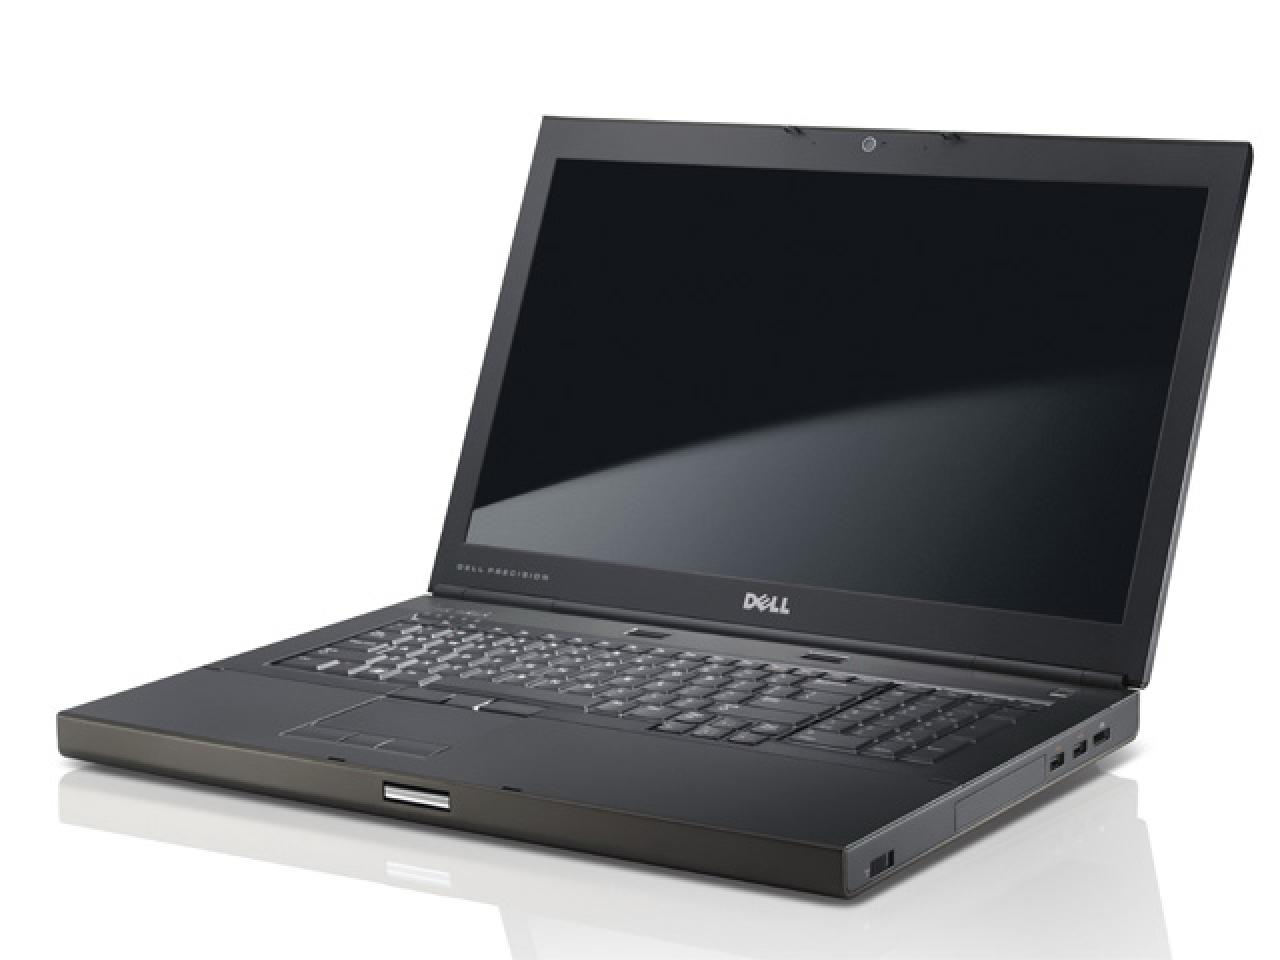 Dell Precision M6600  - shop.bb-net.de